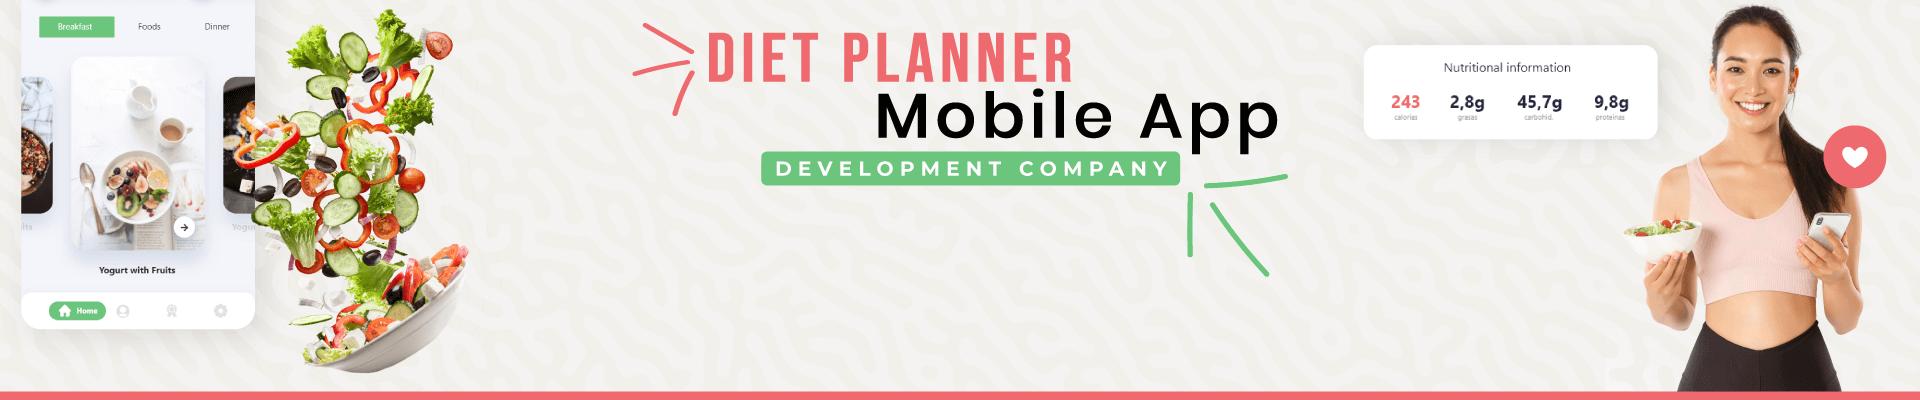 Best Diet Planner Mobile App Development Company | Diet Planner Mobile App Developers For Hire